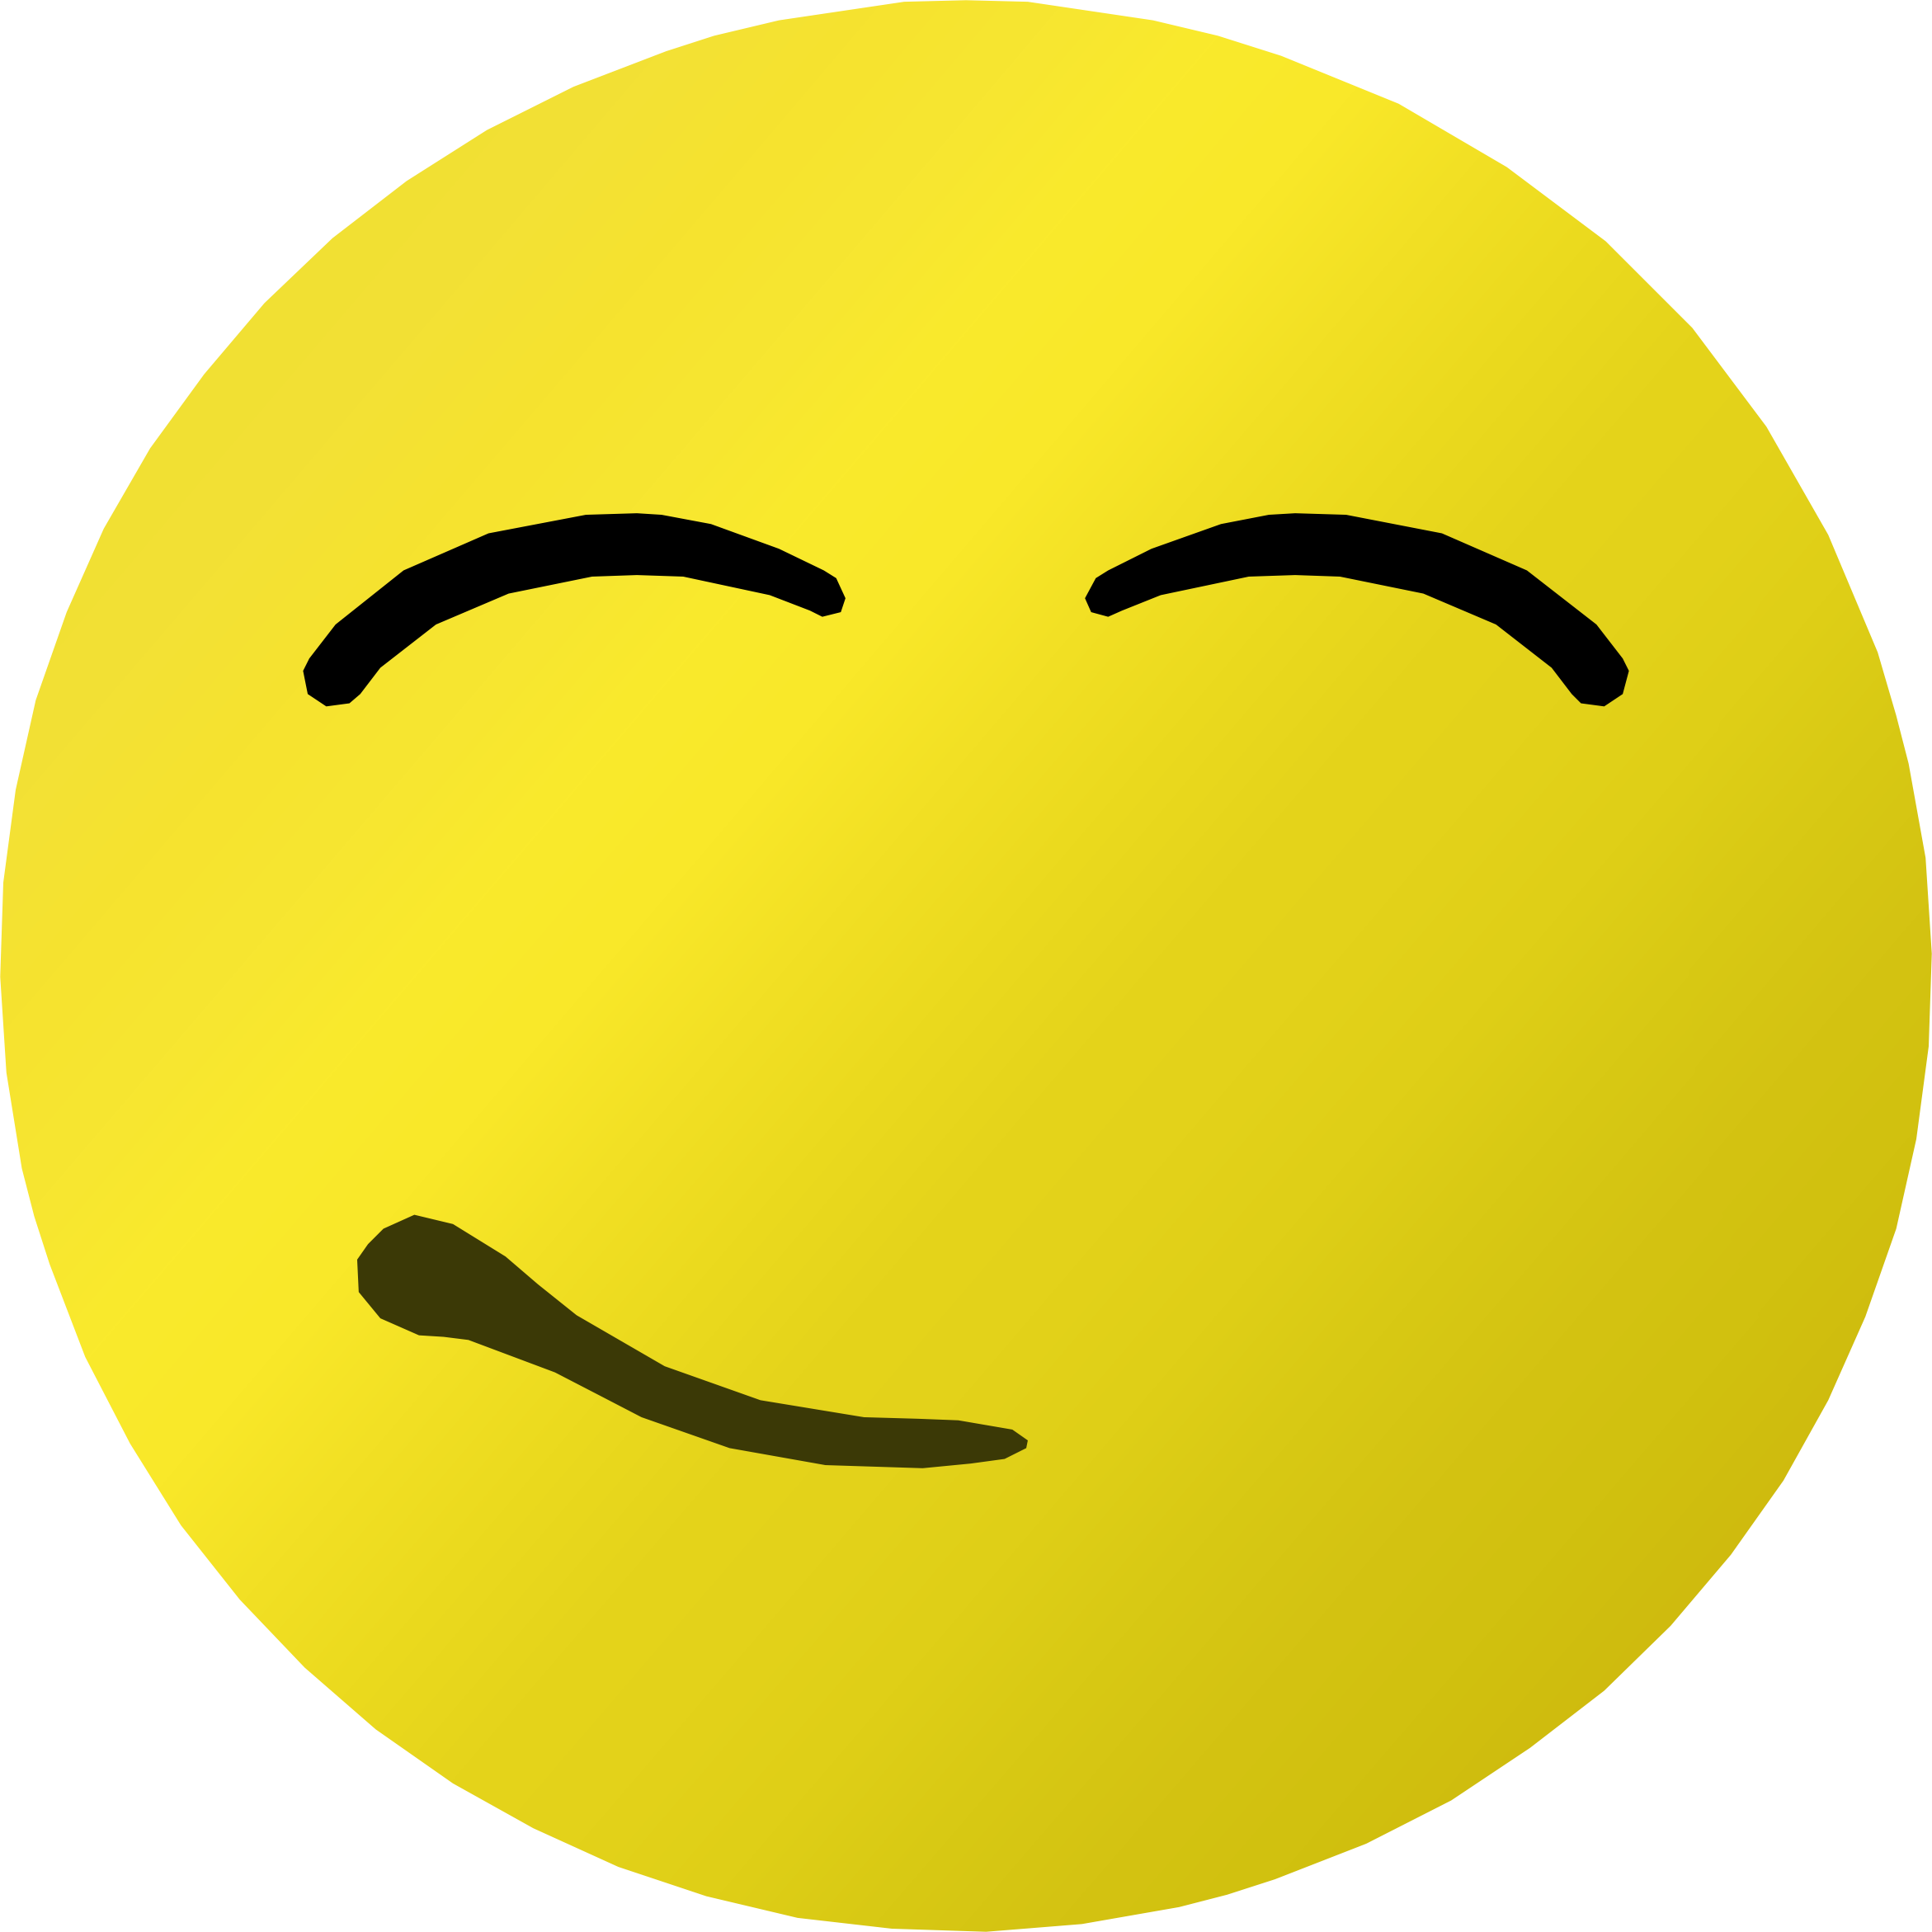 Smile satisfied